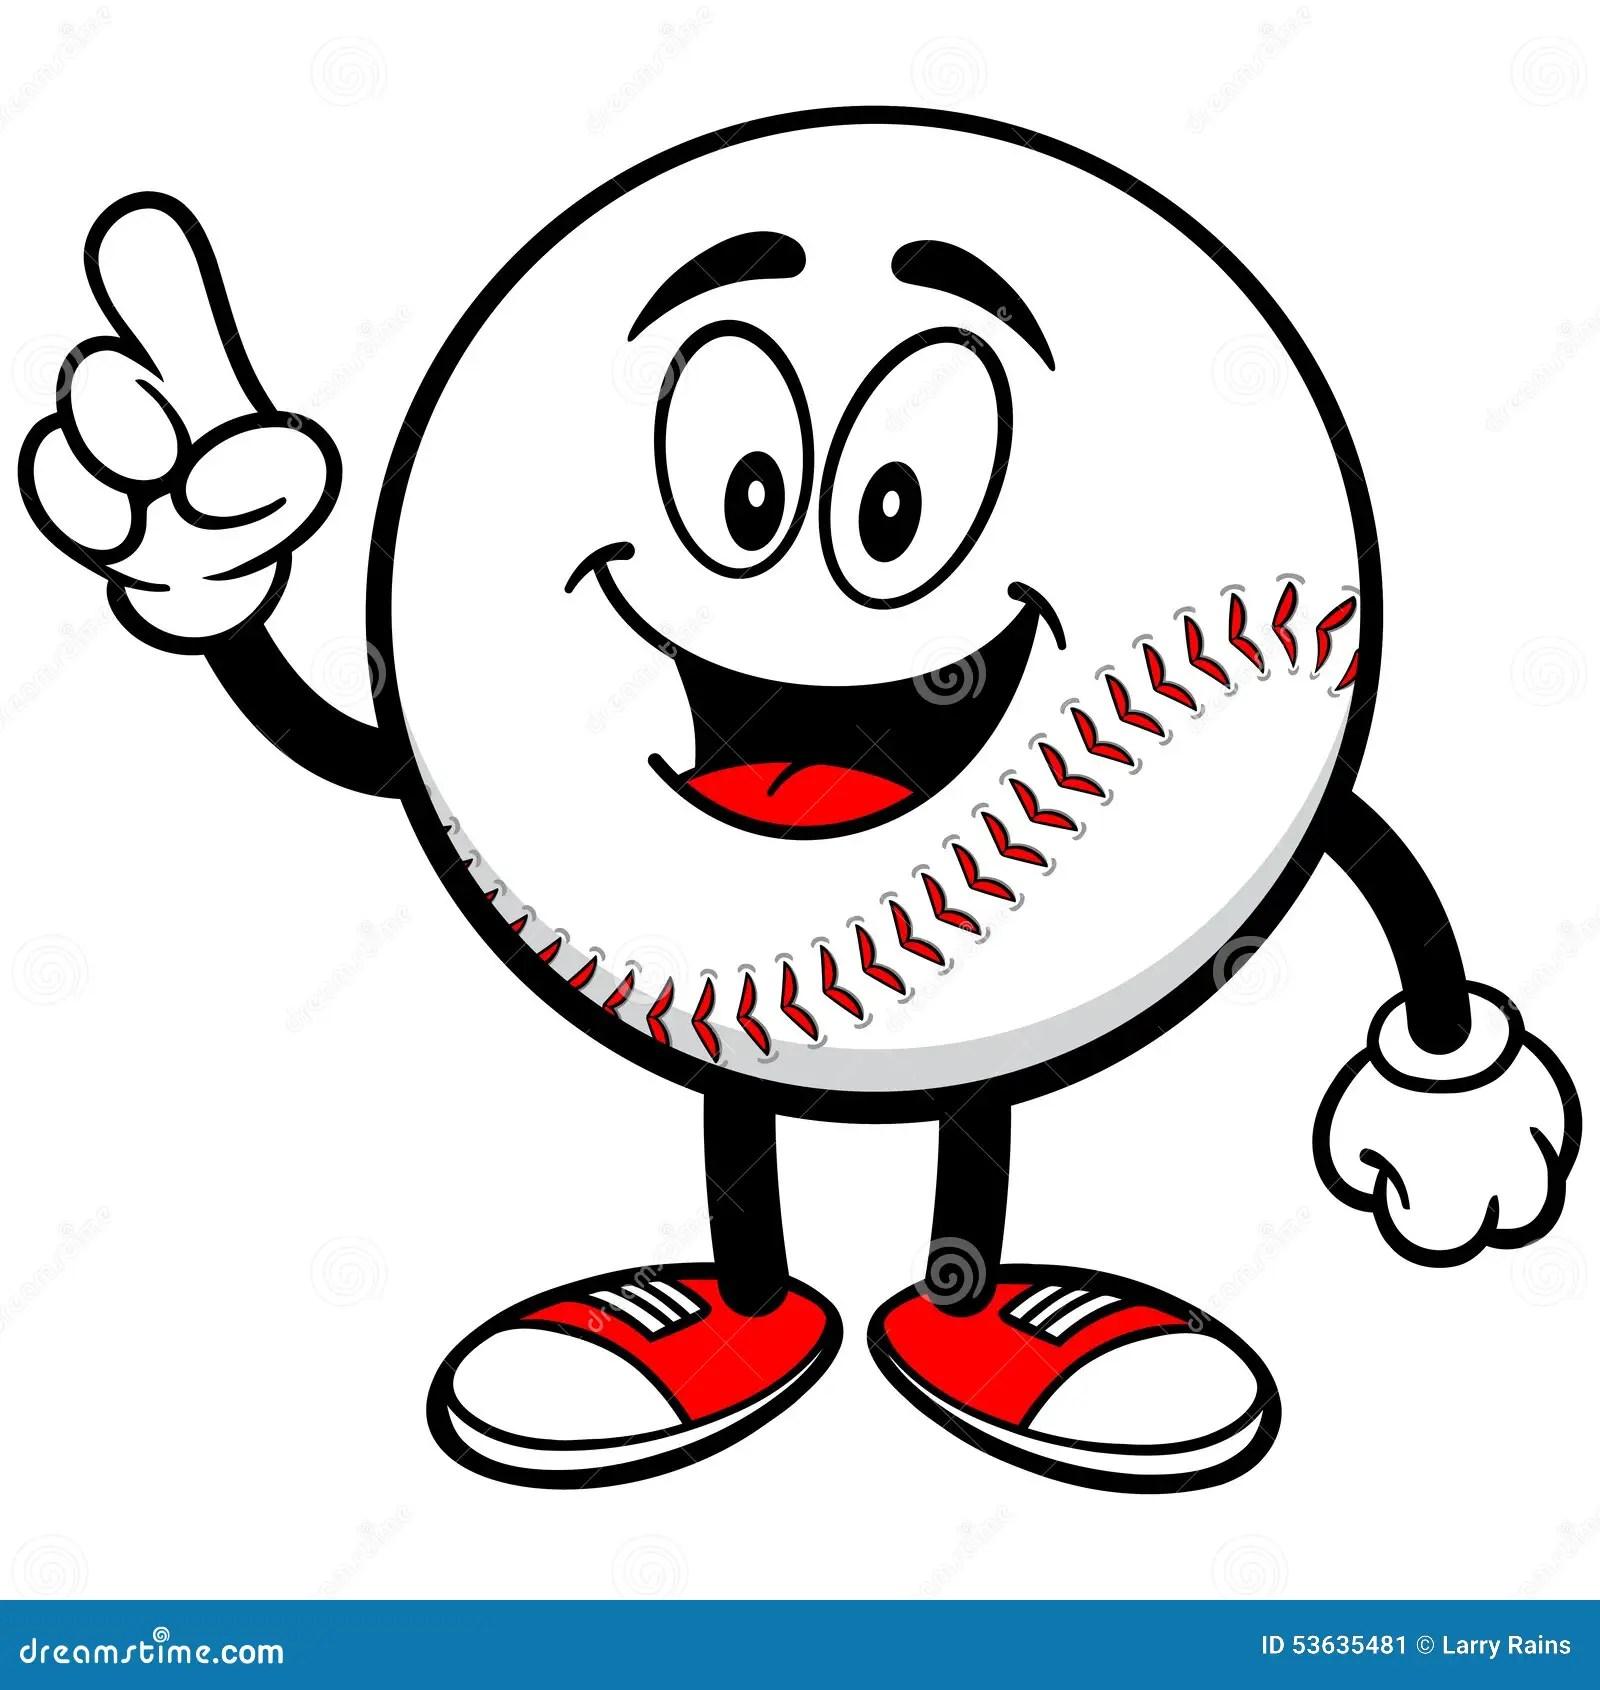 Baseball Mascot Talking Stock Vector Illustration Of